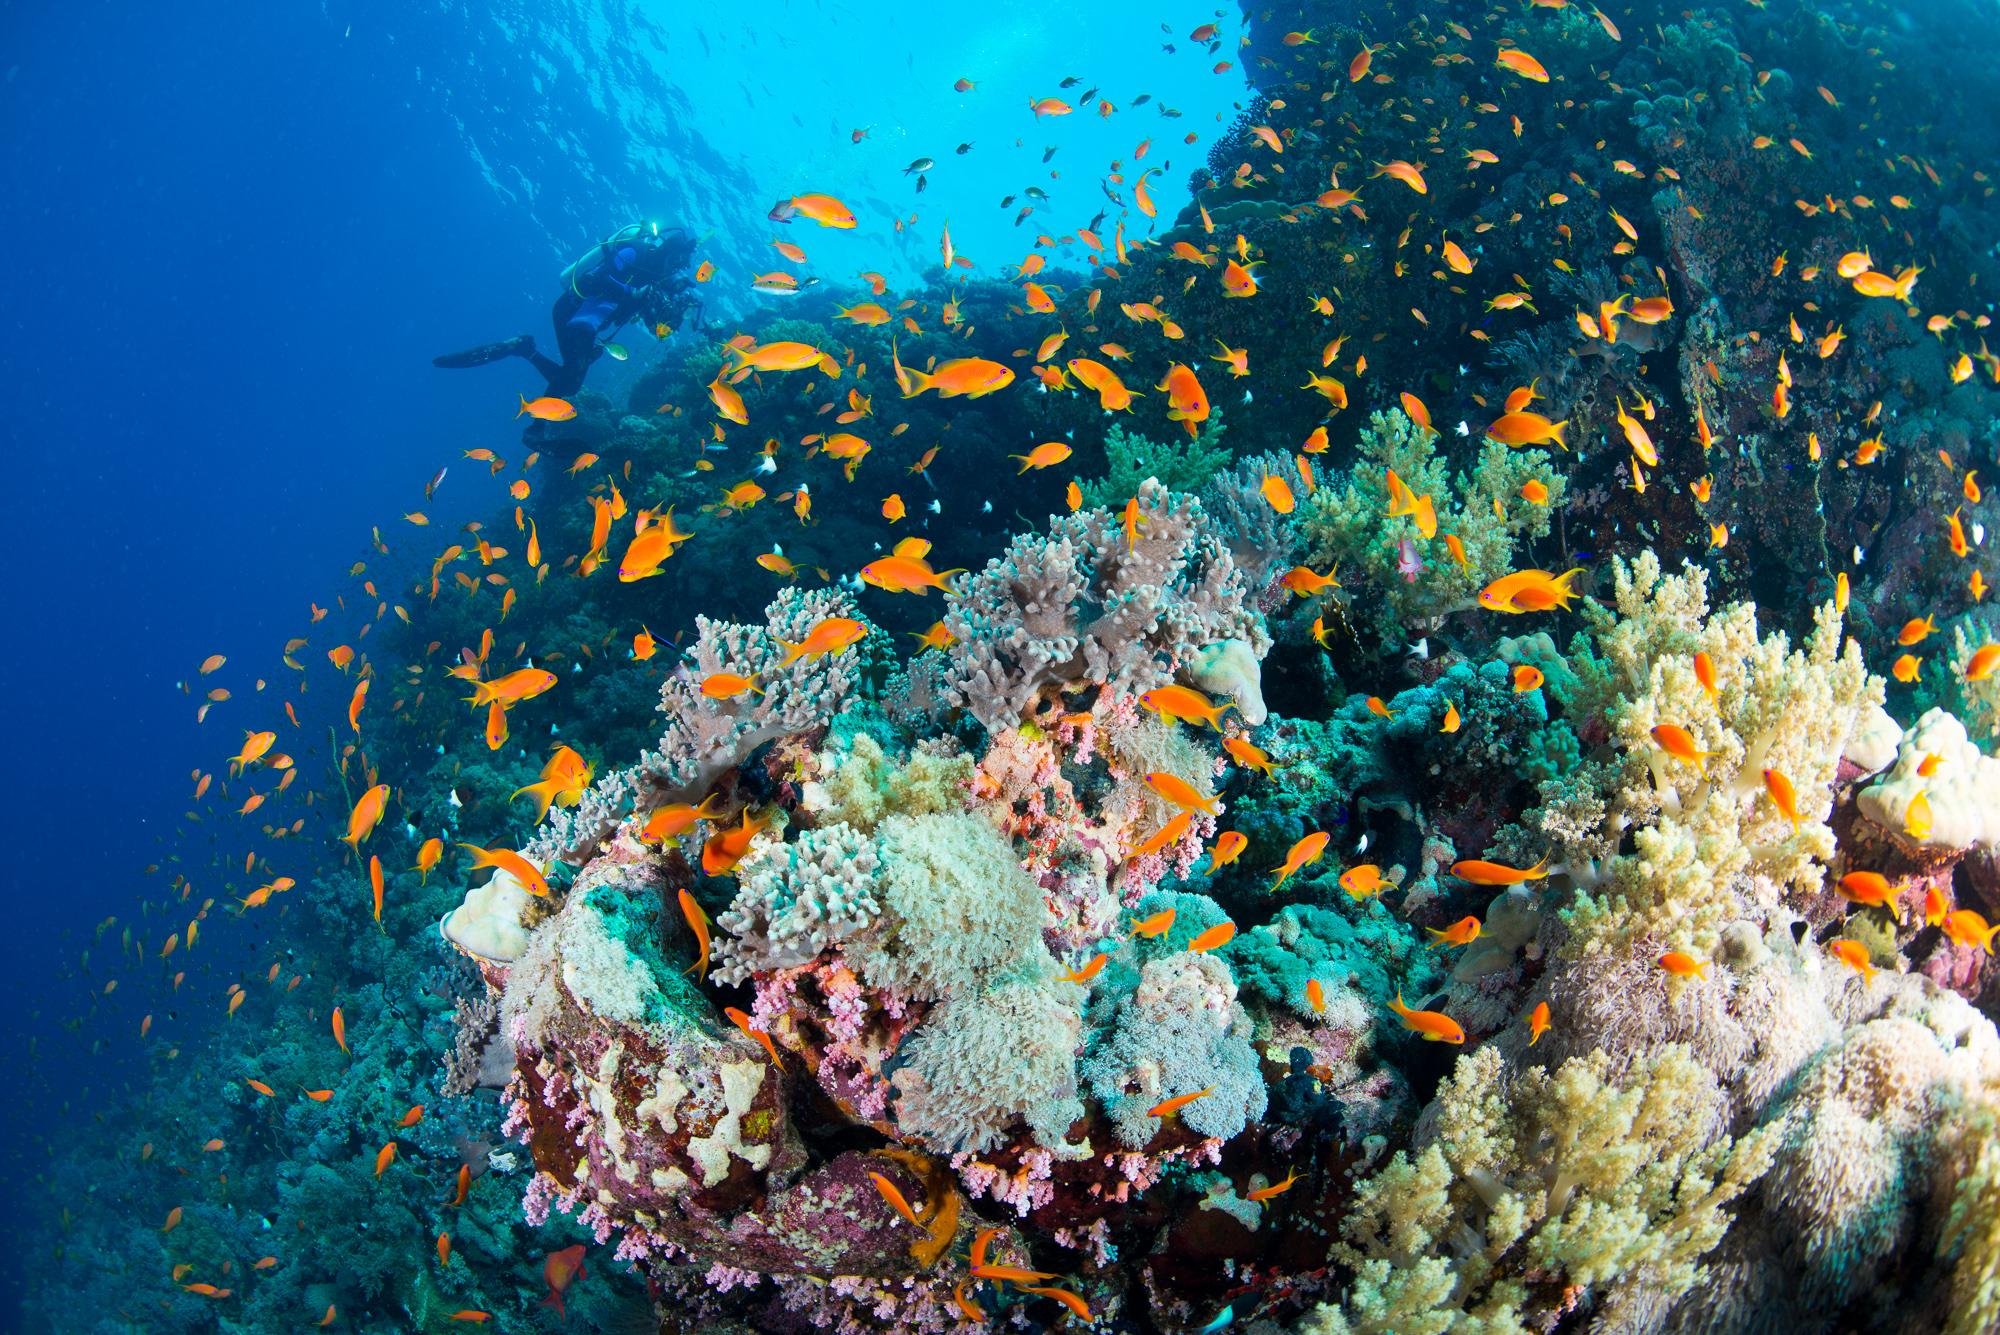 Red Sea Biodiversity Survey